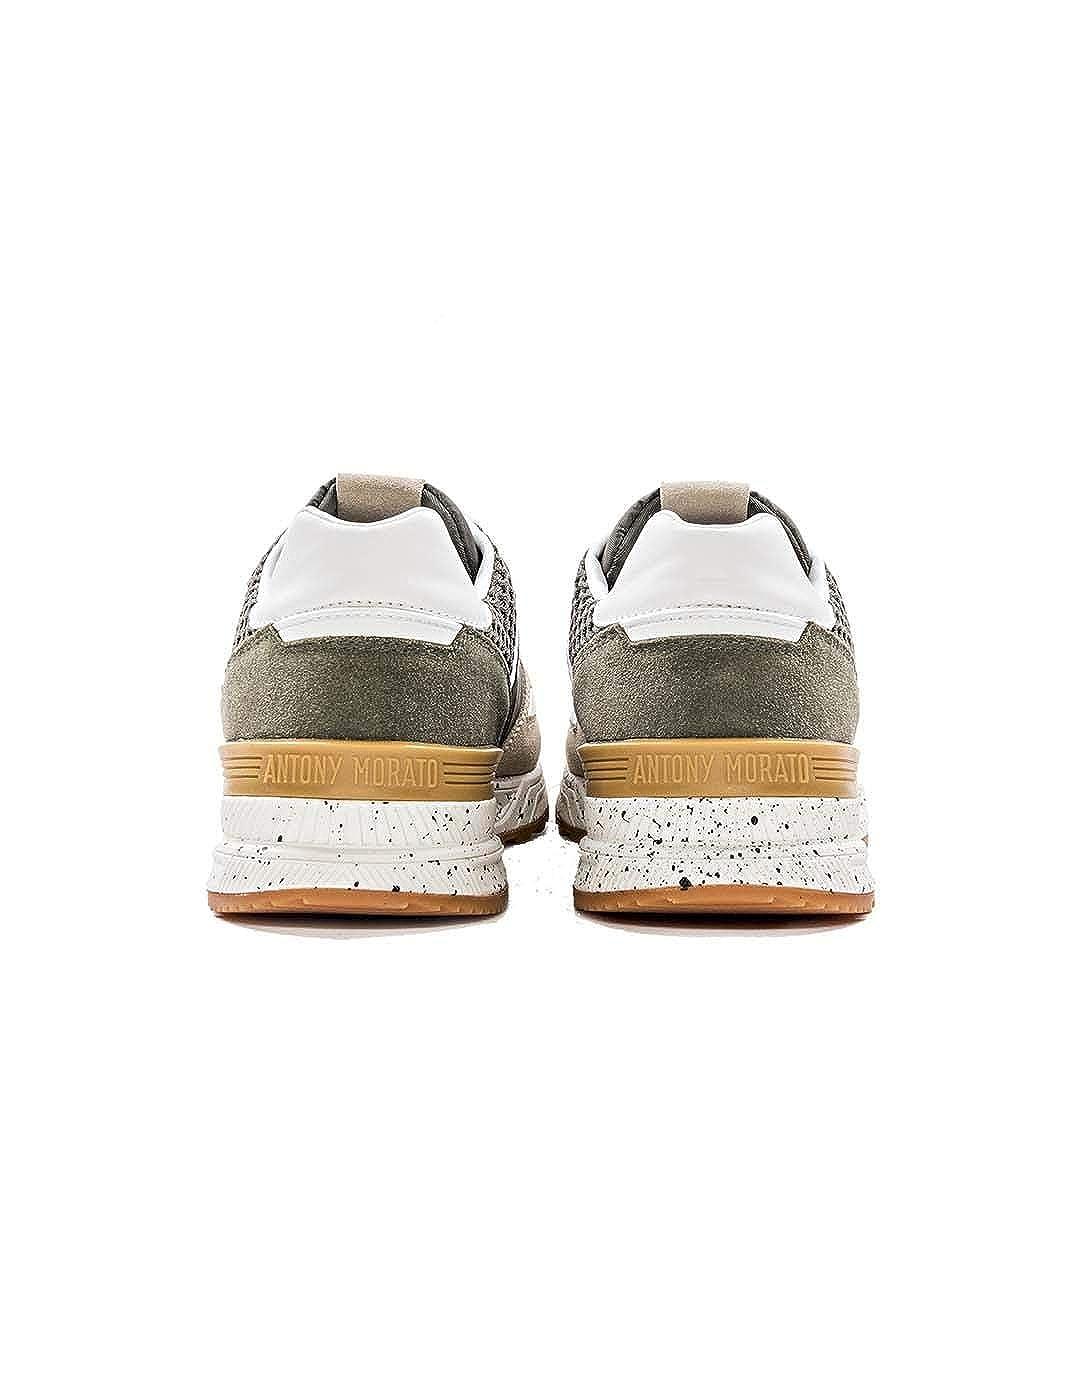 Antony Morato, Morato, Morato, scarpe da ginnastica Uomo Kaki 3dc012